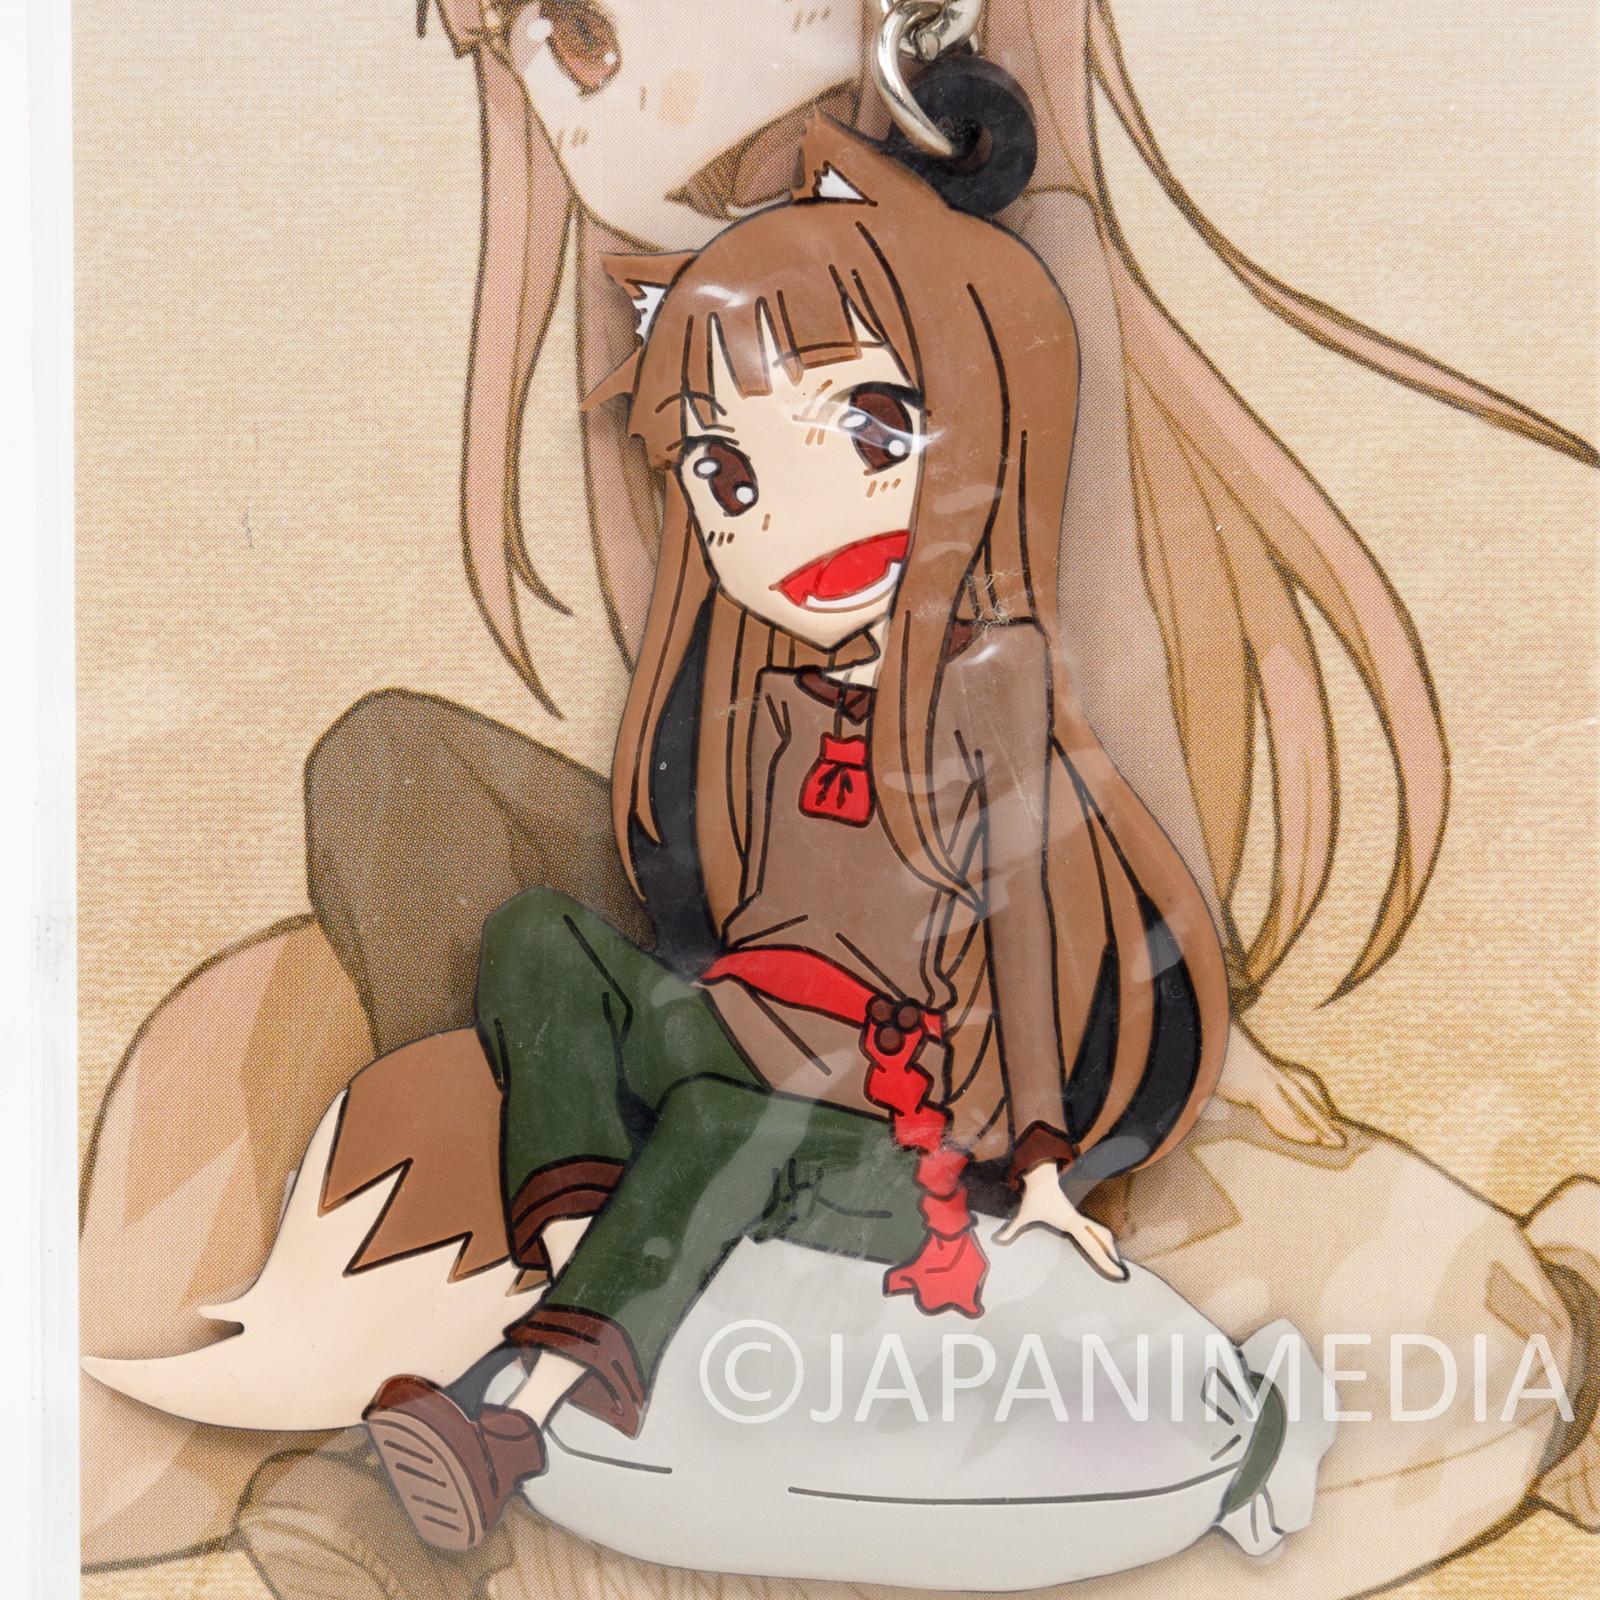 Retro RARE! Spice and Wolf Holo Rubber Mascot Keychain Okami to Koushinryou